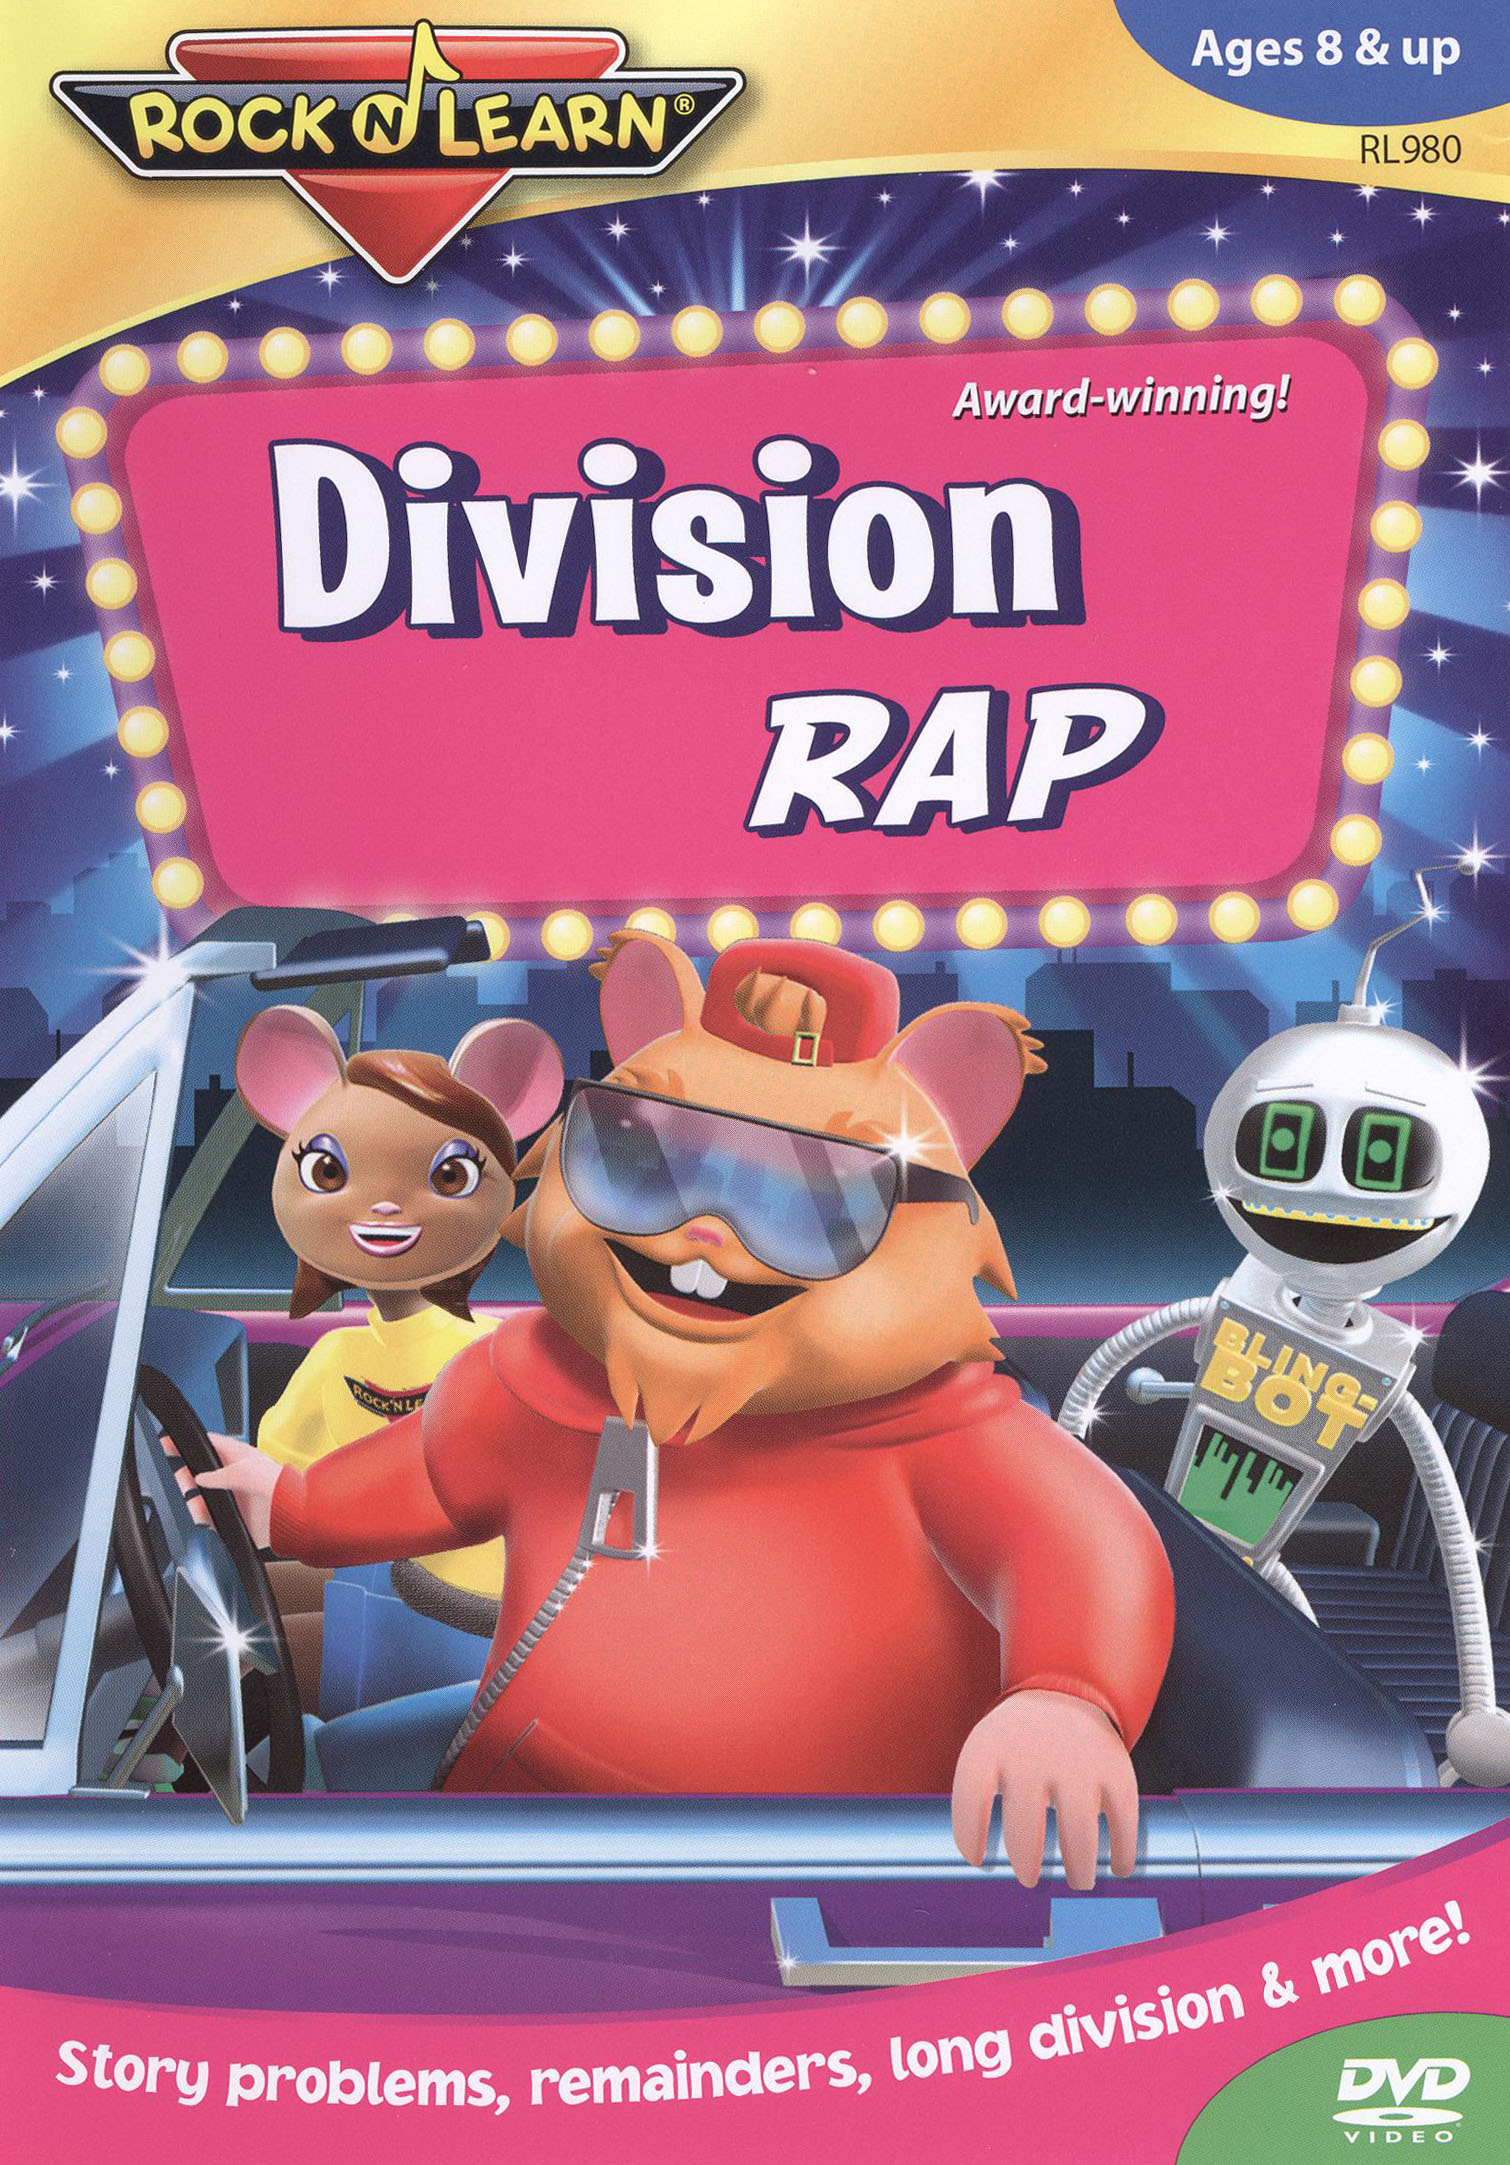 Rock 'N Learn: Division Rap